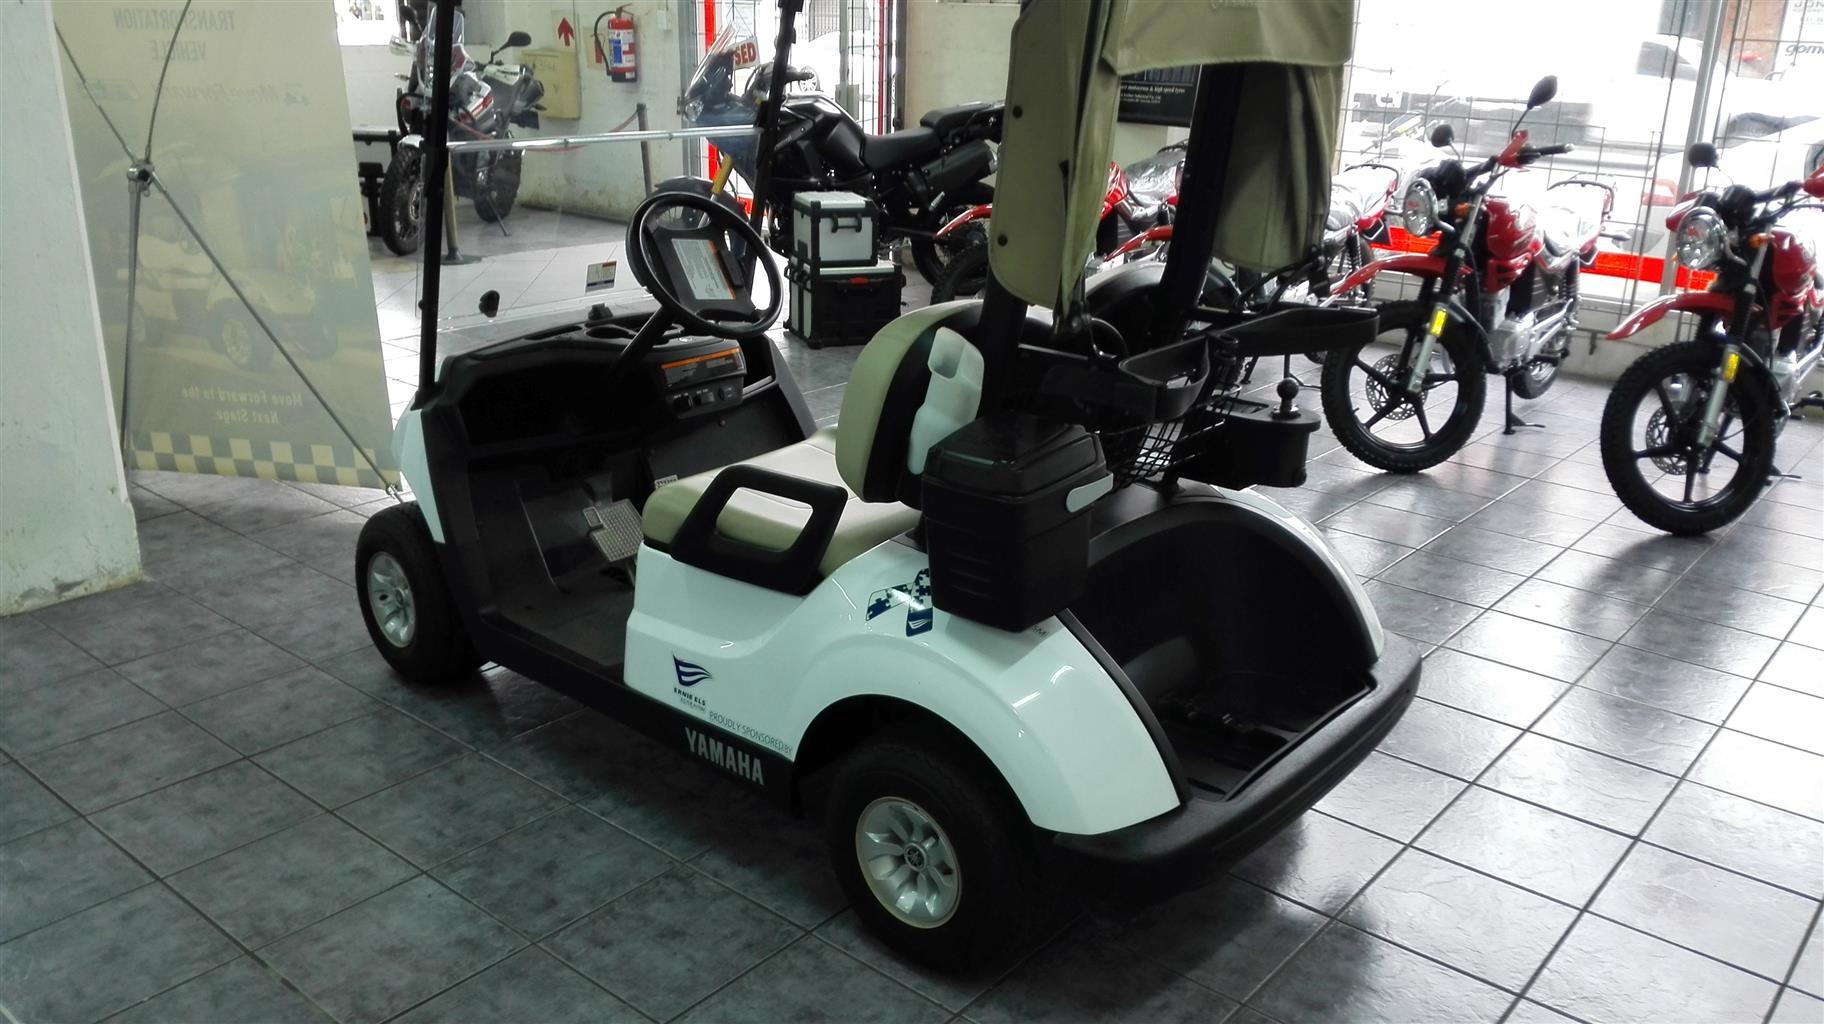 2017 Yamaha Electric Golf Cart. | Junk Mail on golf hole 8, golf lunch sponsor, beverage cart sponsor, golf hole sponsor,